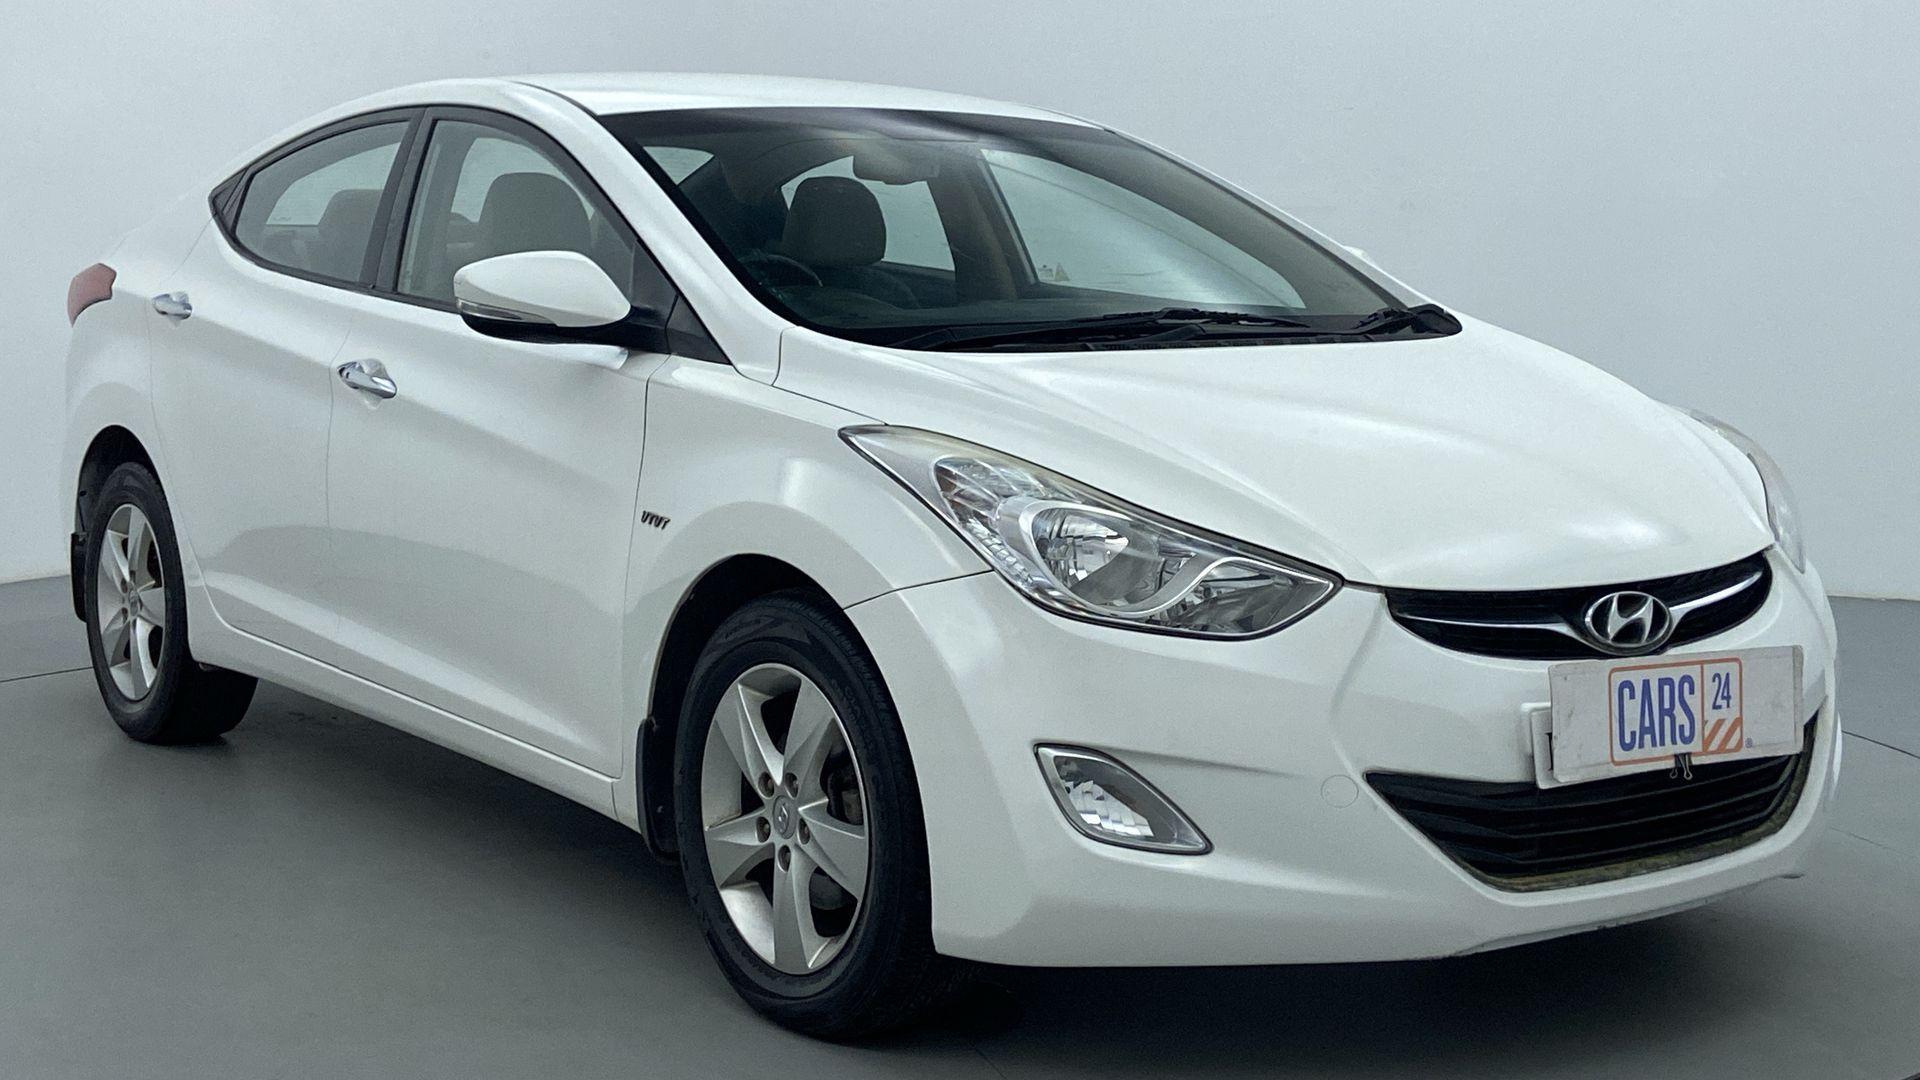 2013 Hyundai New Elantra S 1.8 MT